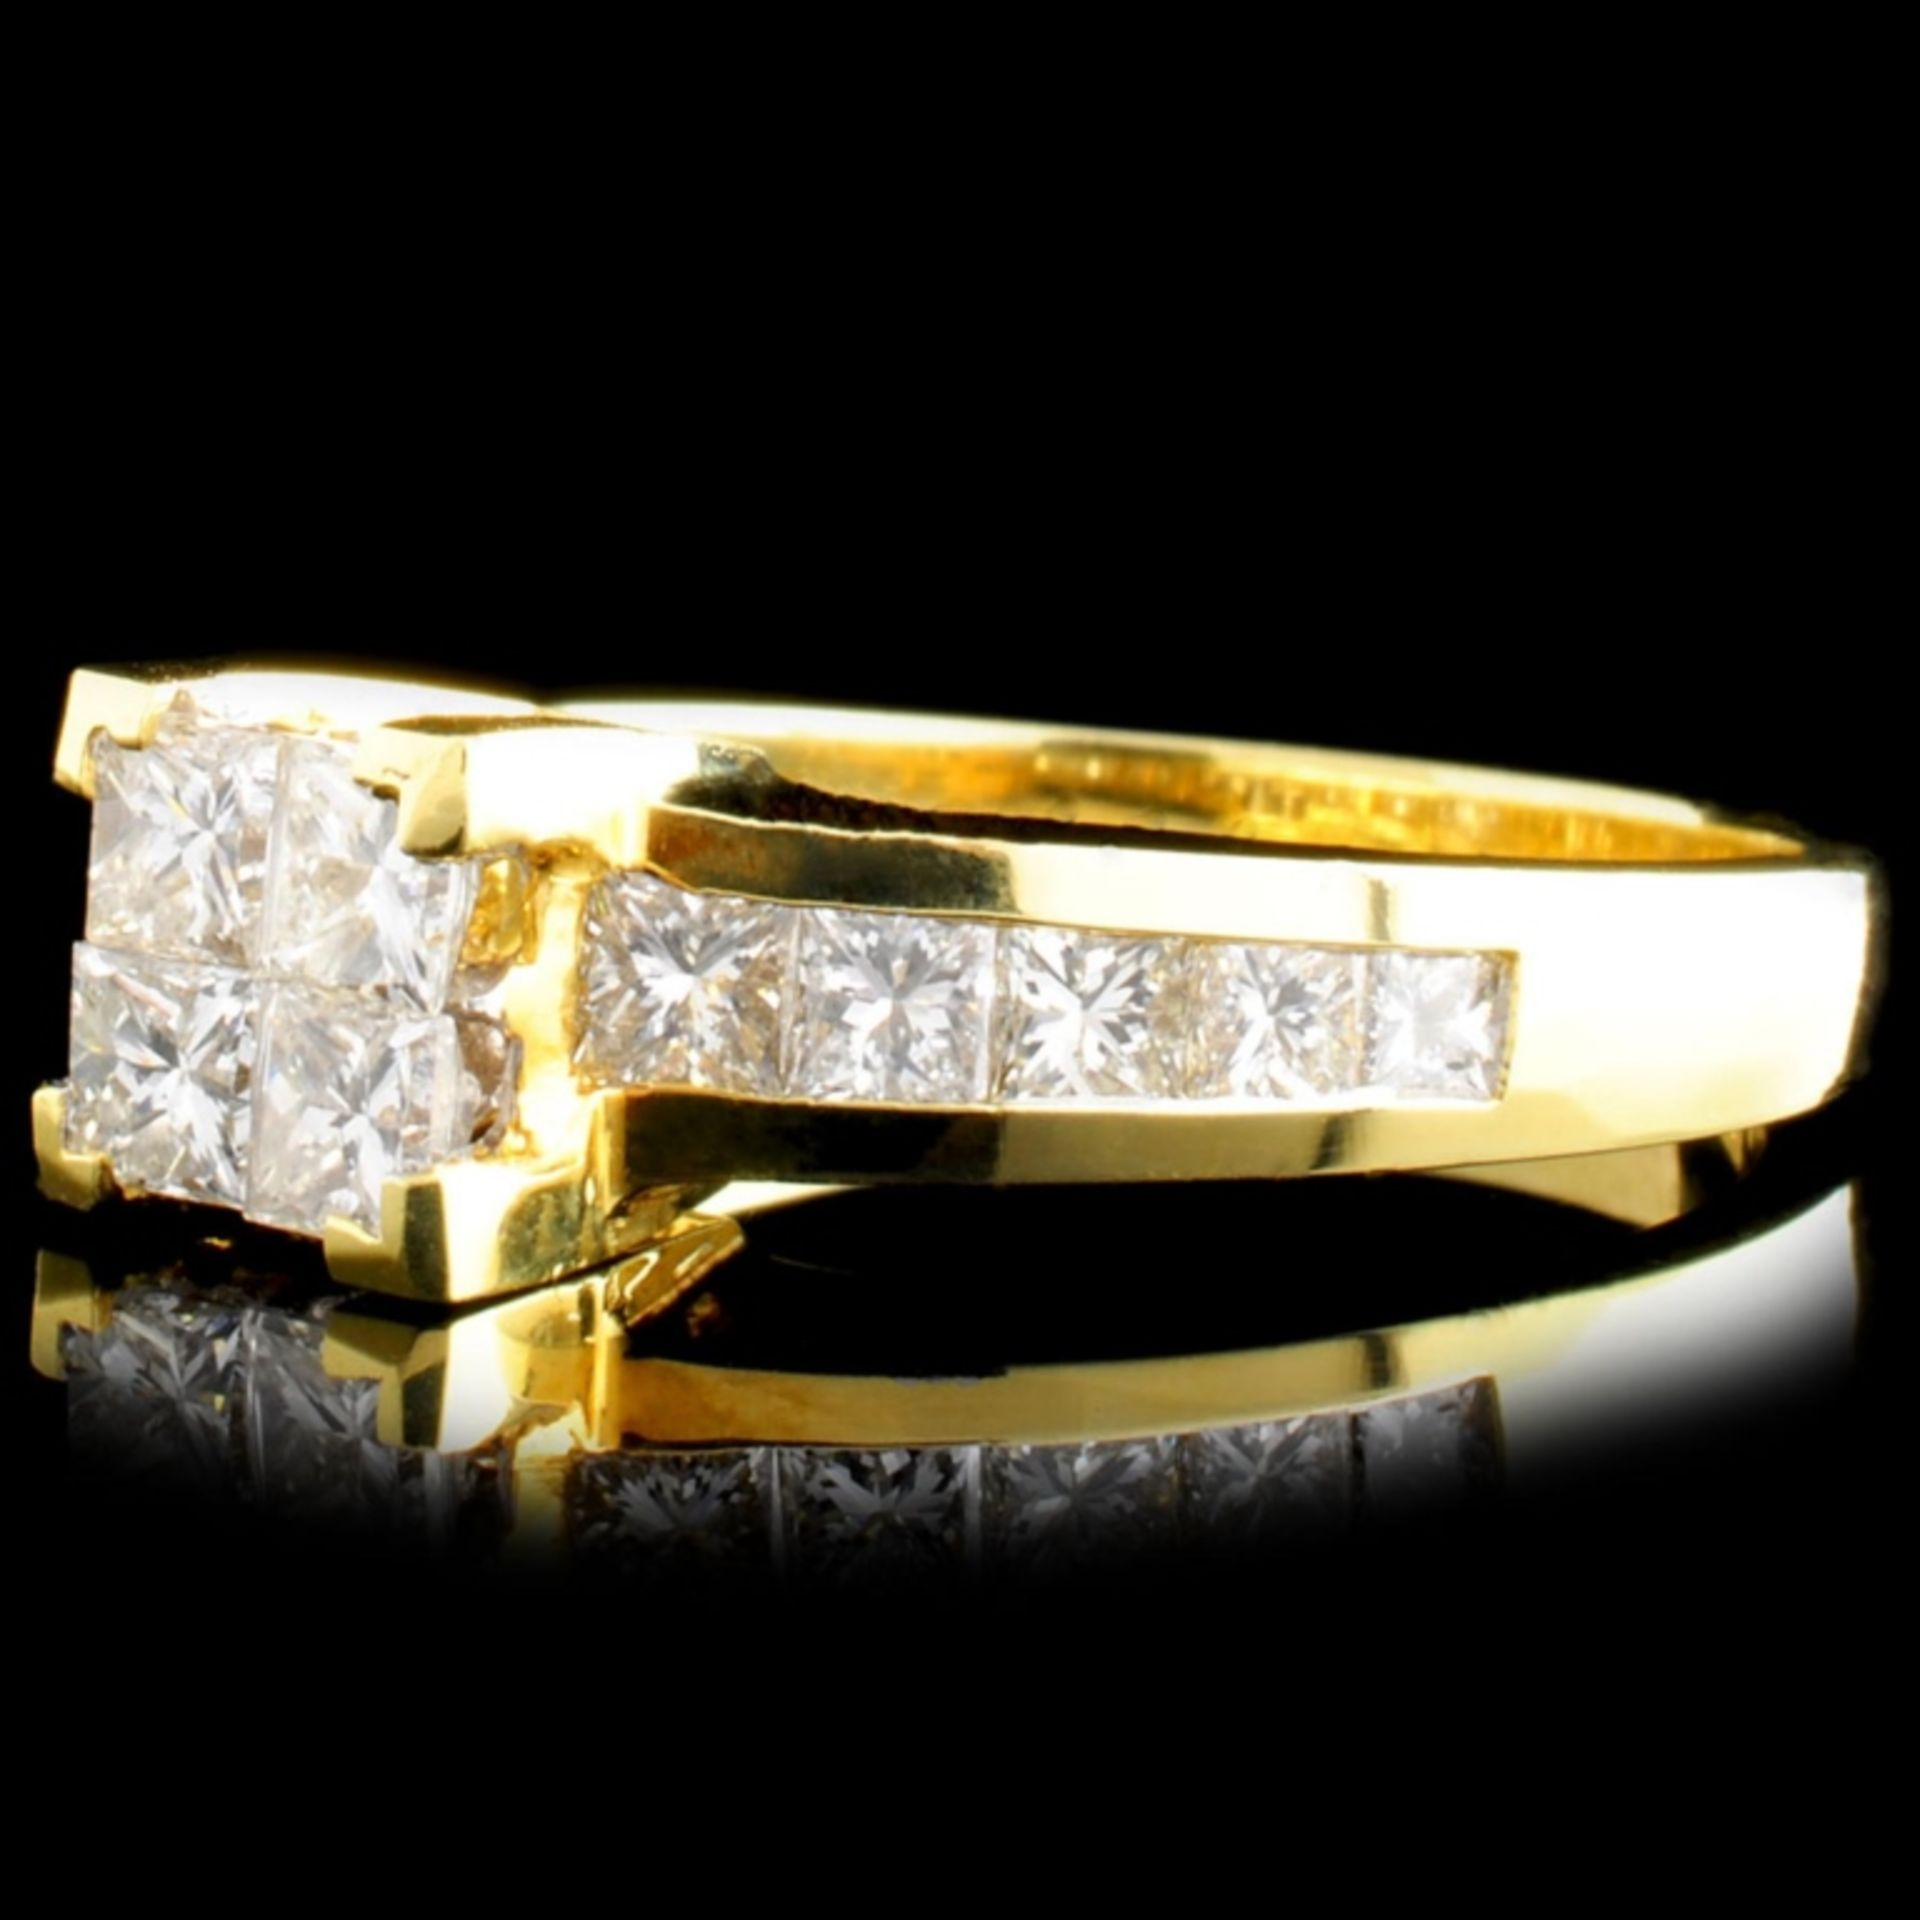 18K Gold 1.50ctw Diamond Ring - Image 2 of 5